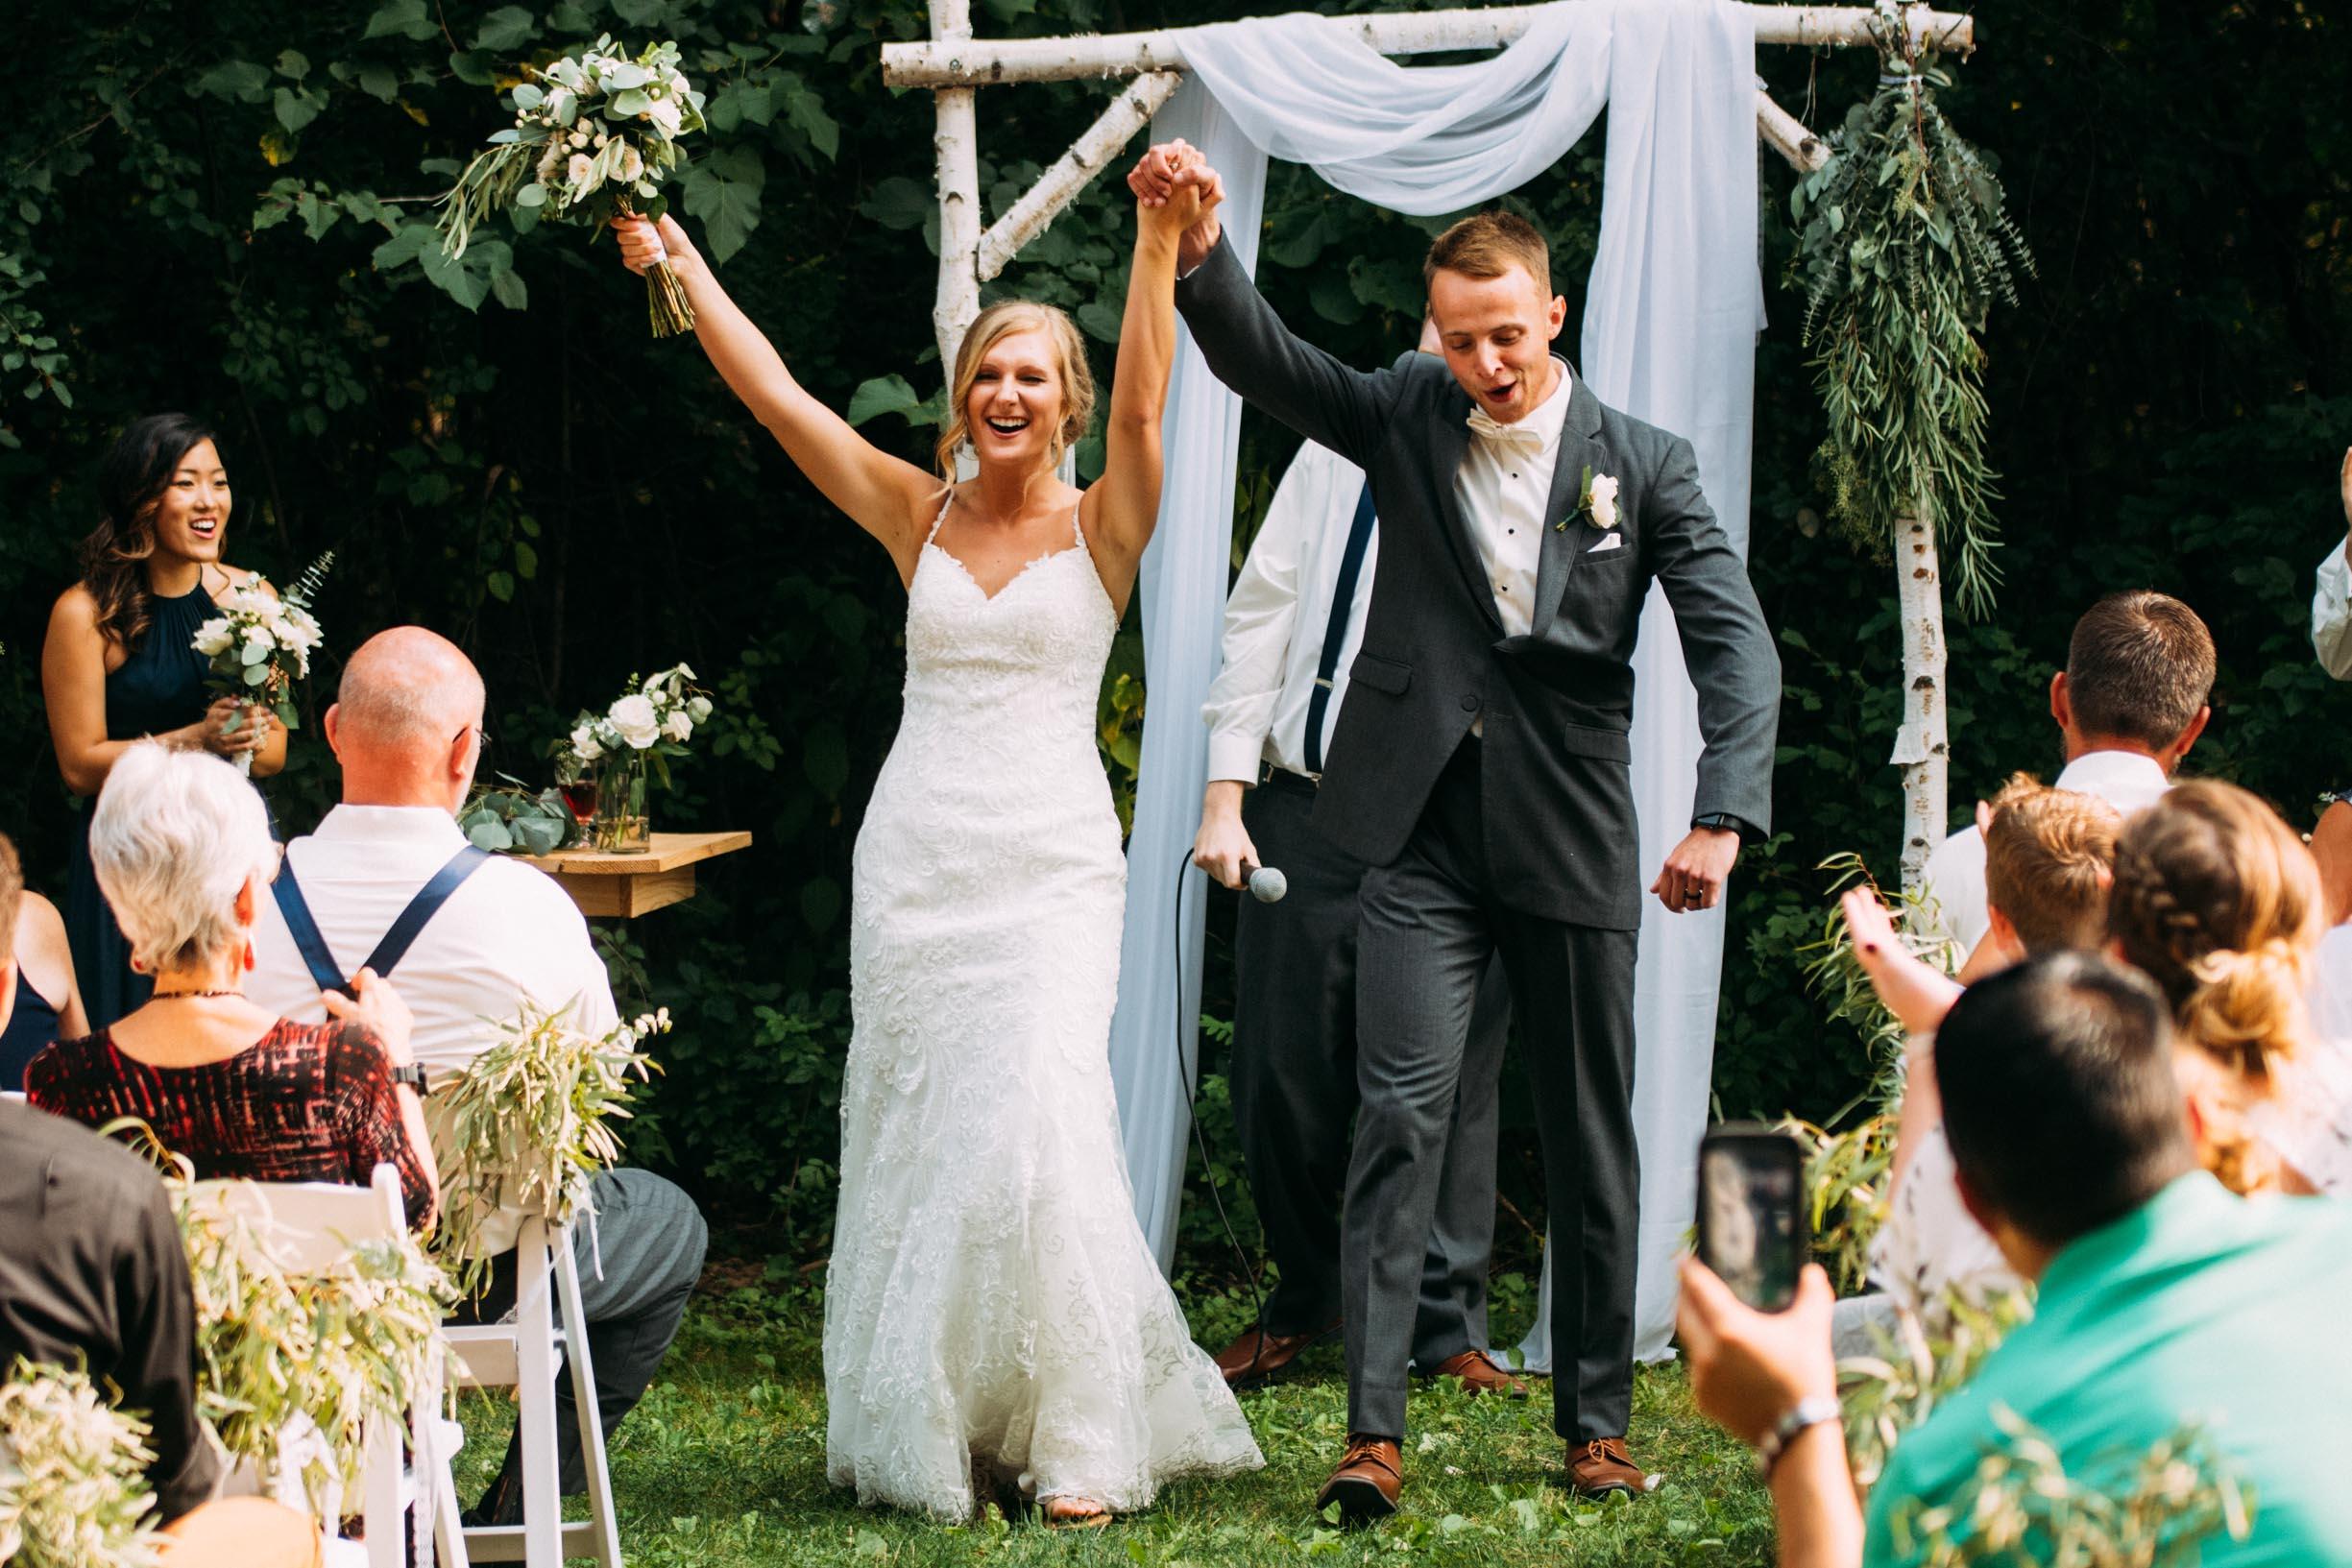 25-Minnetonka Orchards Wedding Ashley Bryce Blog.jpg